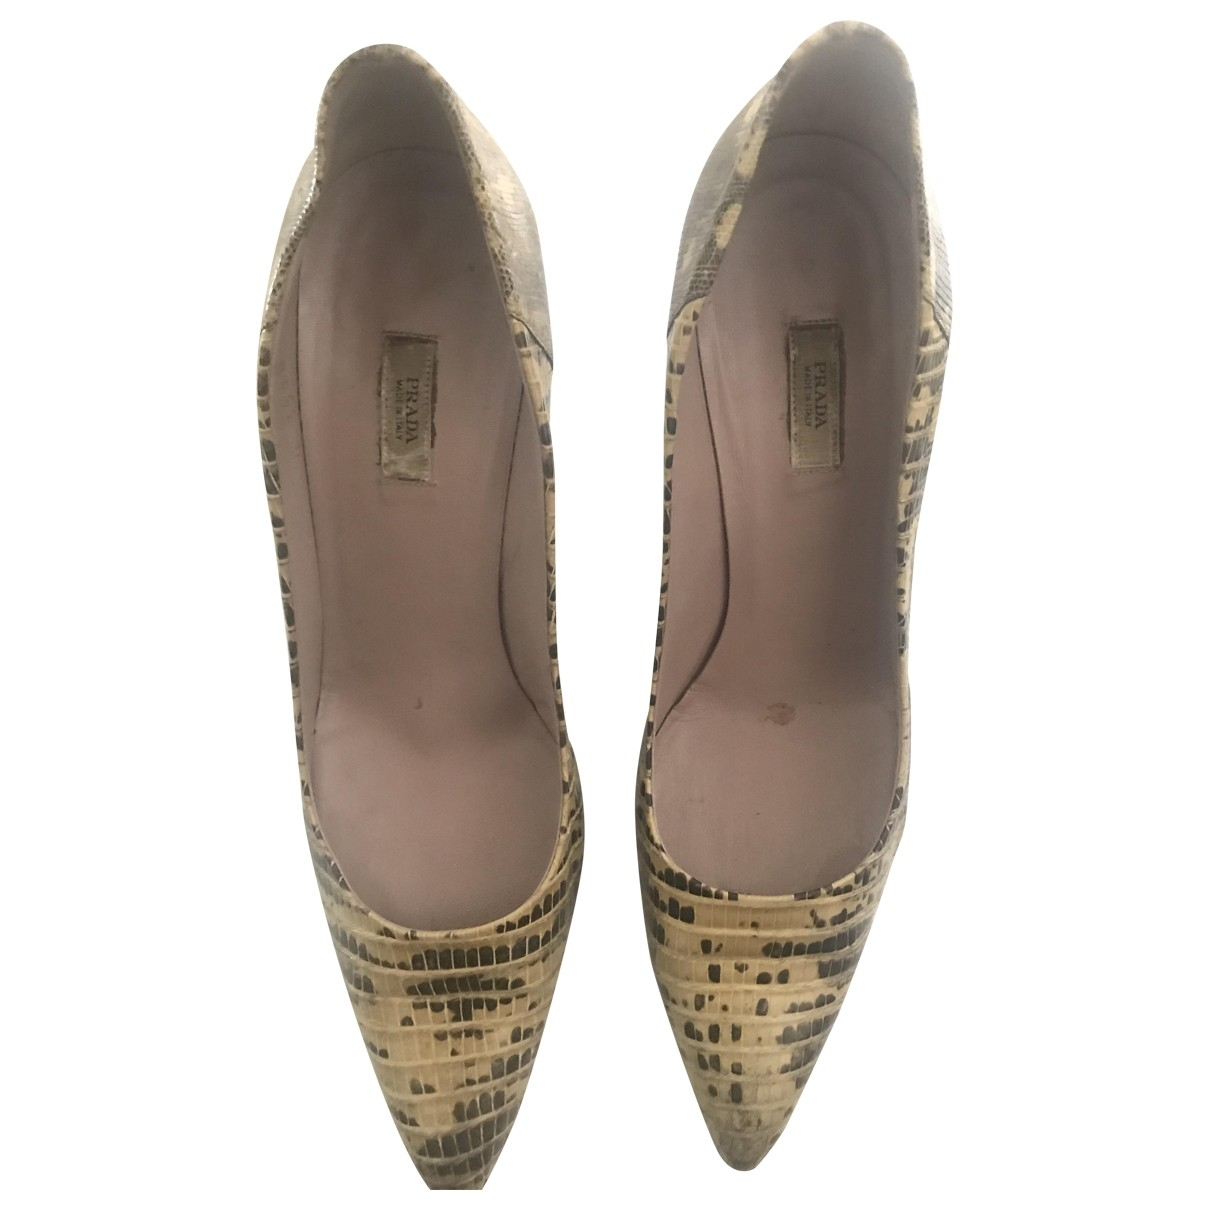 Prada \N Beige Leather Heels for Women 38.5 EU